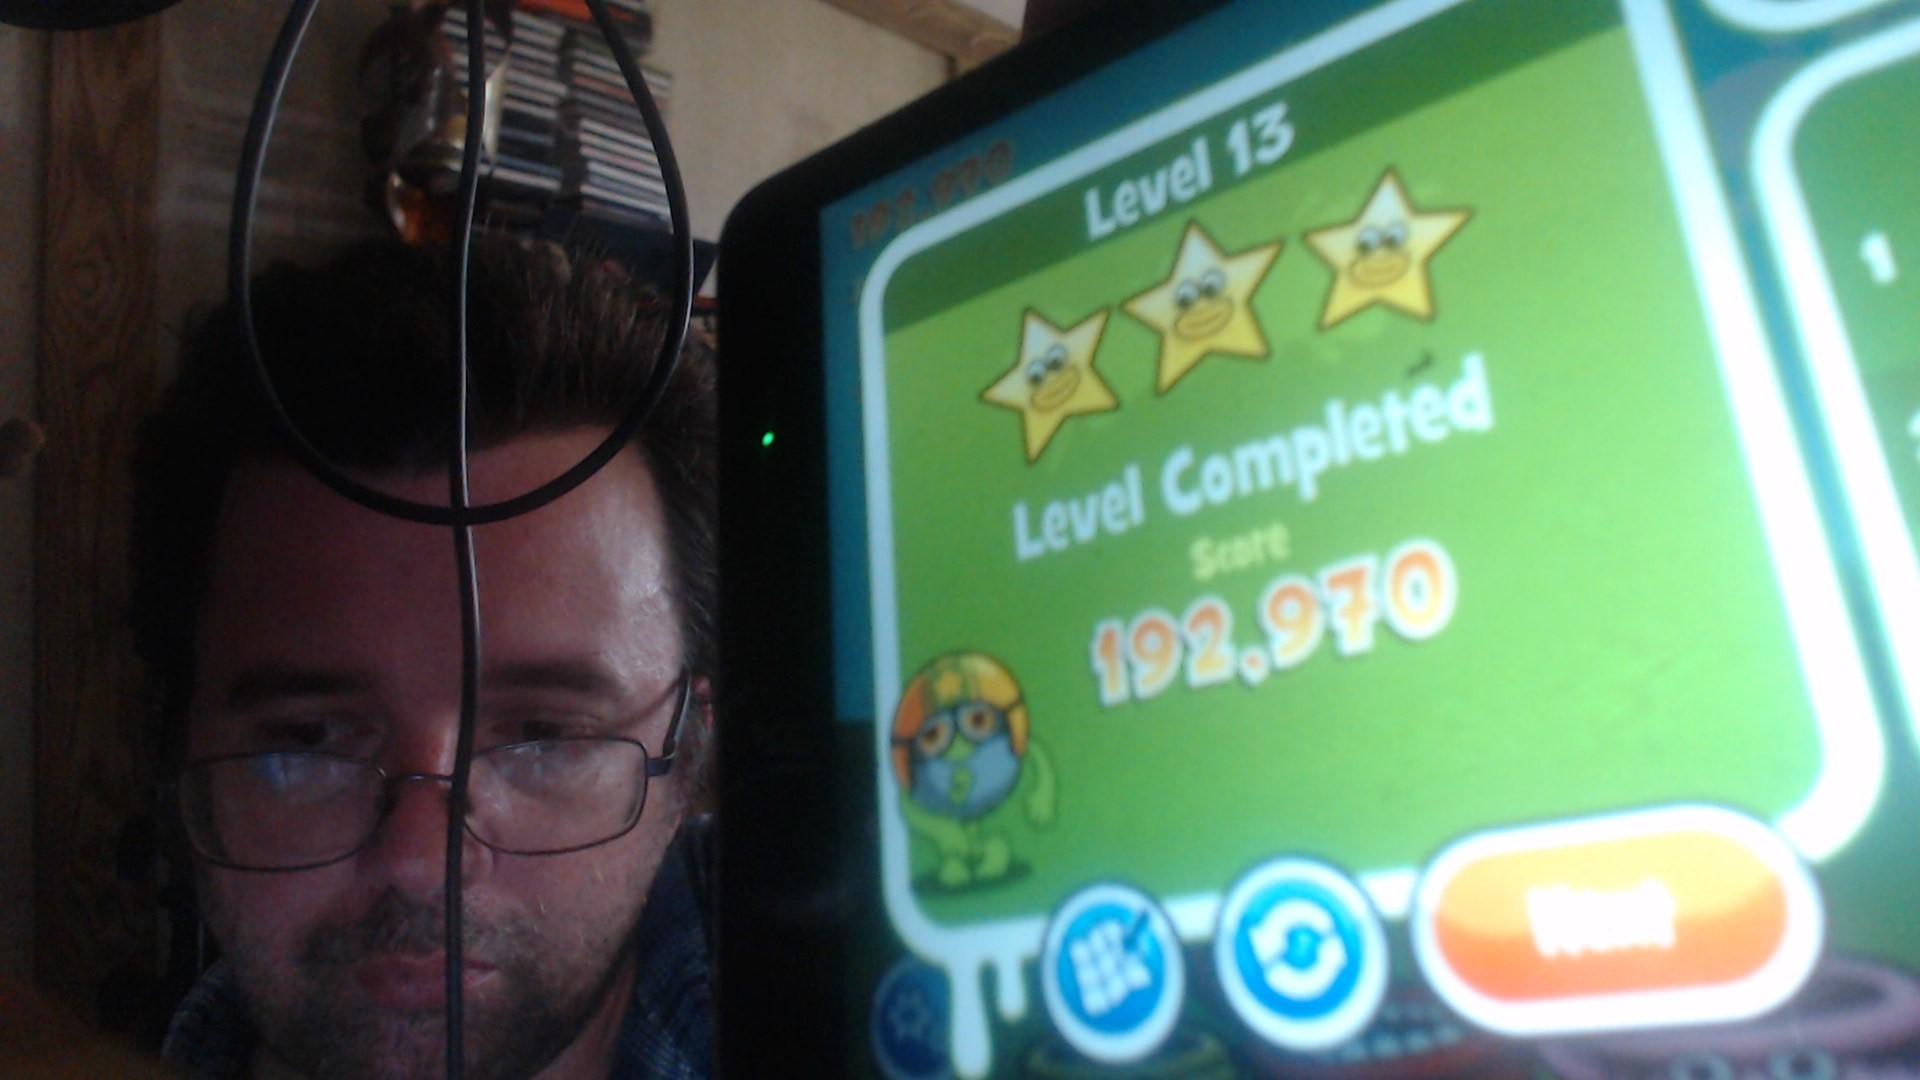 Papa Pear Saga: Level 013 192,970 points